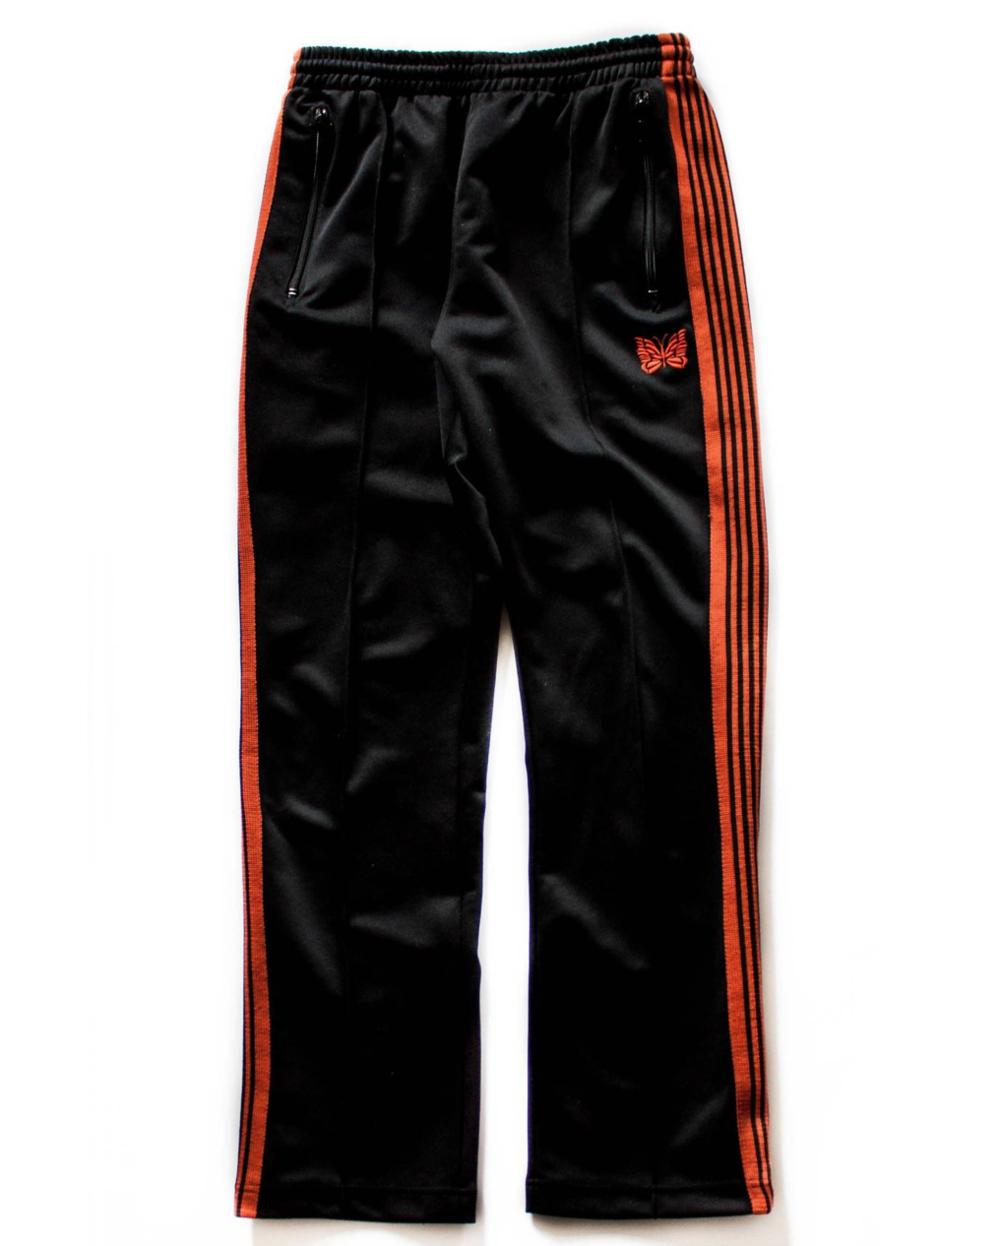 - TRACK PANTS / Needs $348